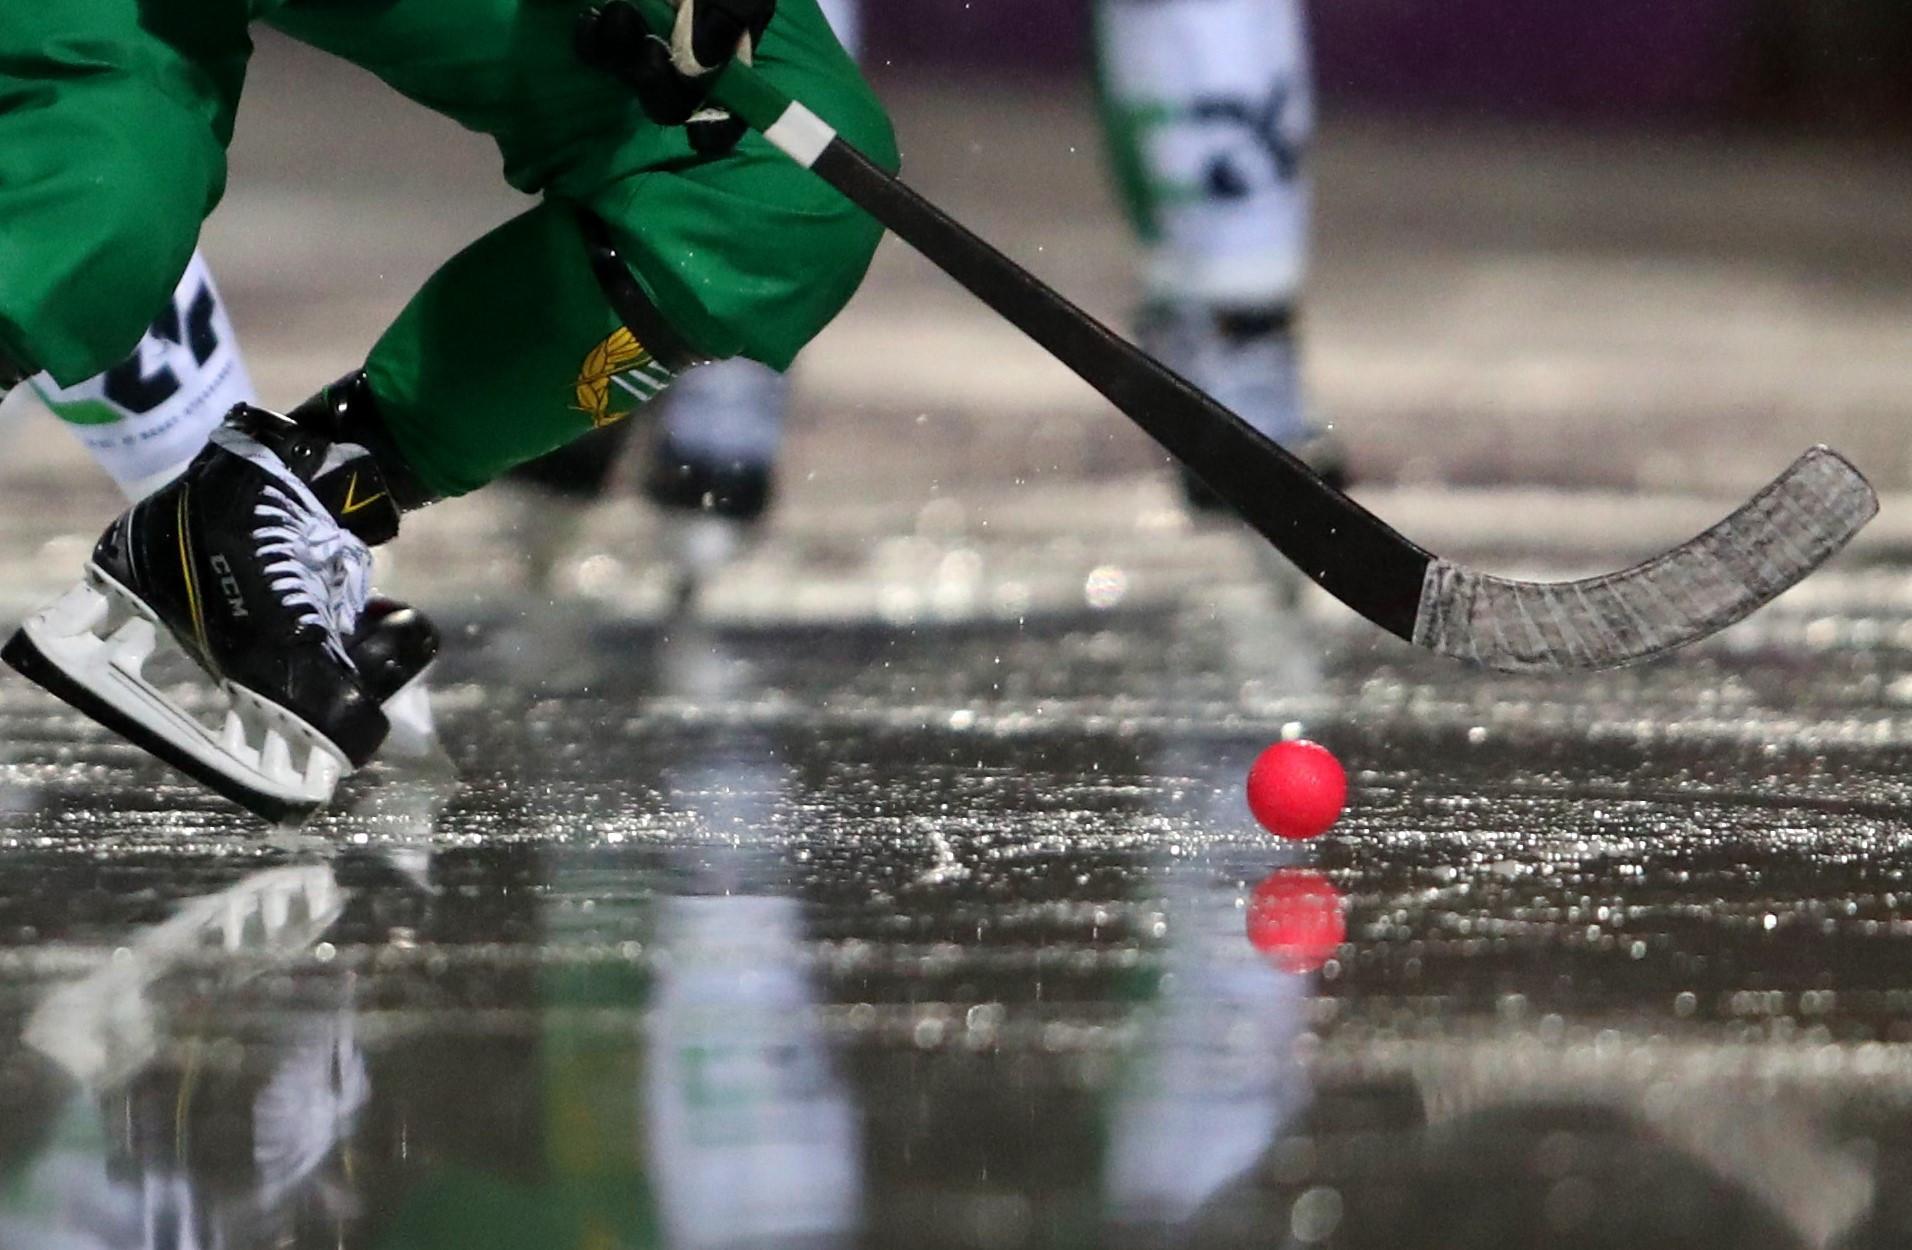 Men's Bandy World Championship in Irkutsk given October dates